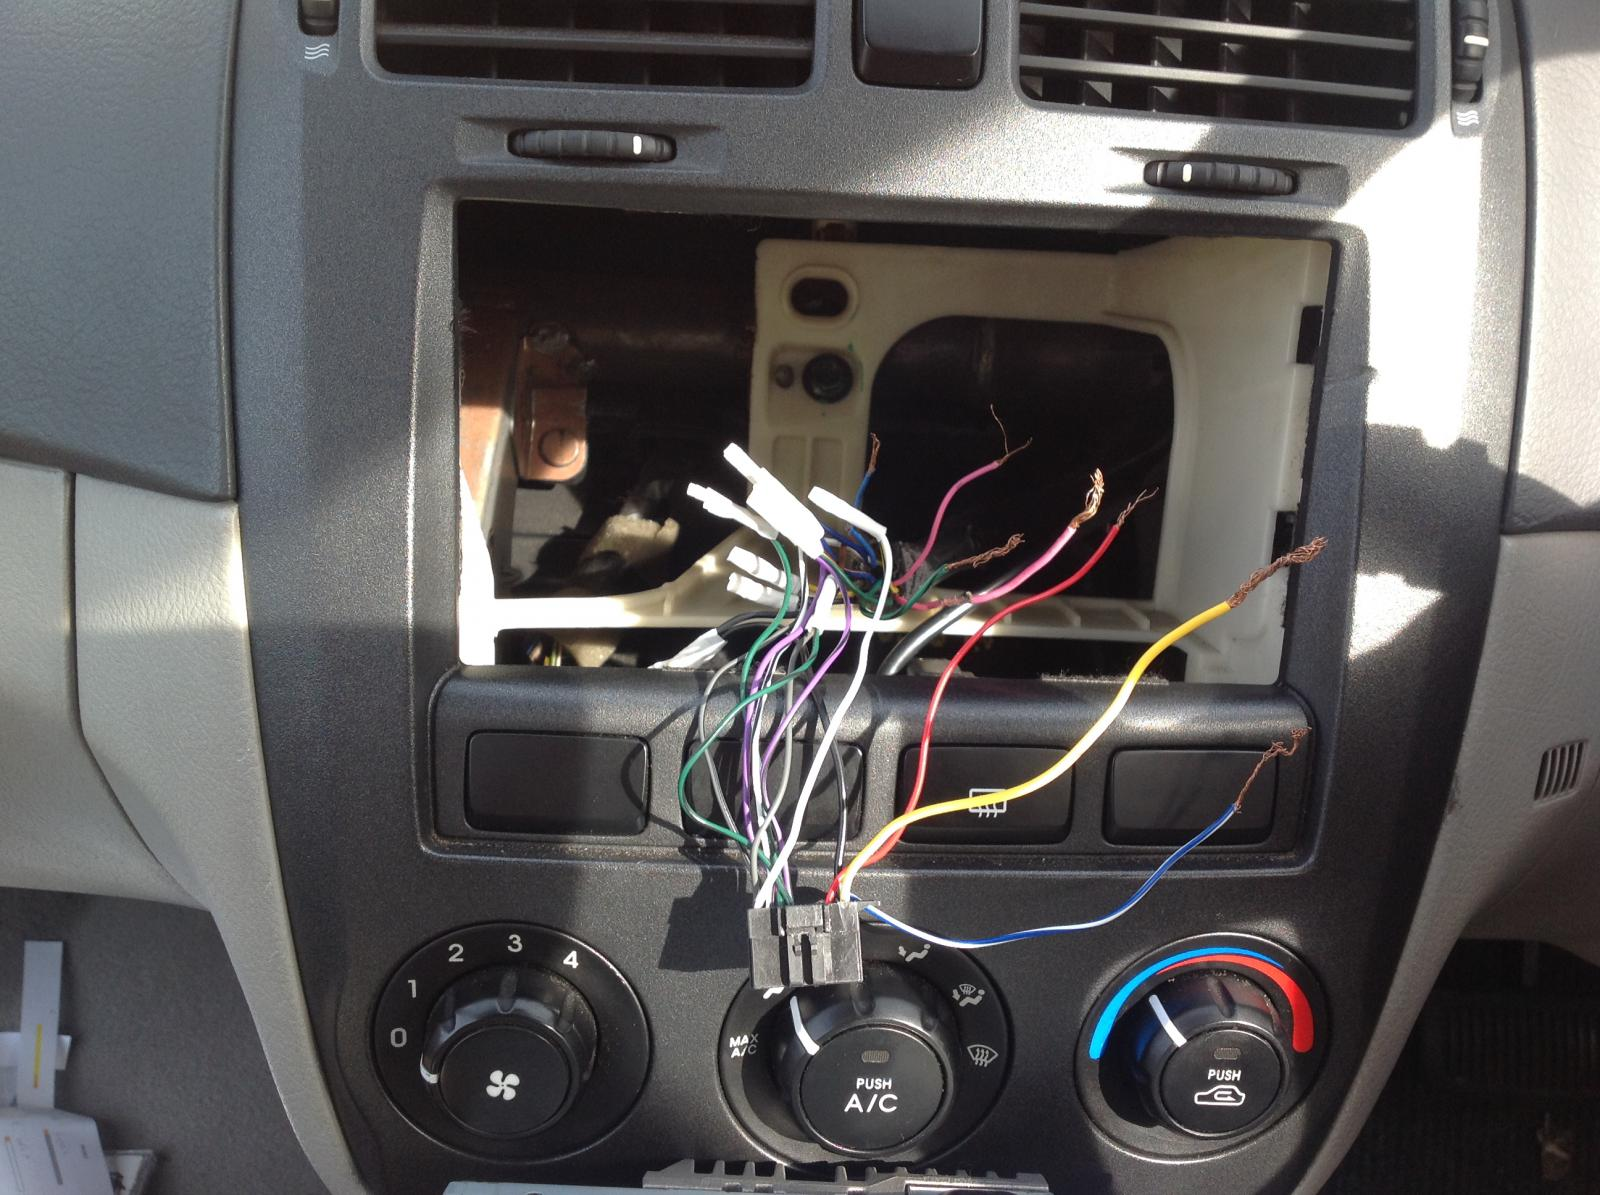 kia rio wiring diagram stereo shear and moment diagrams for frames cerato 2005 radio nightmare forum